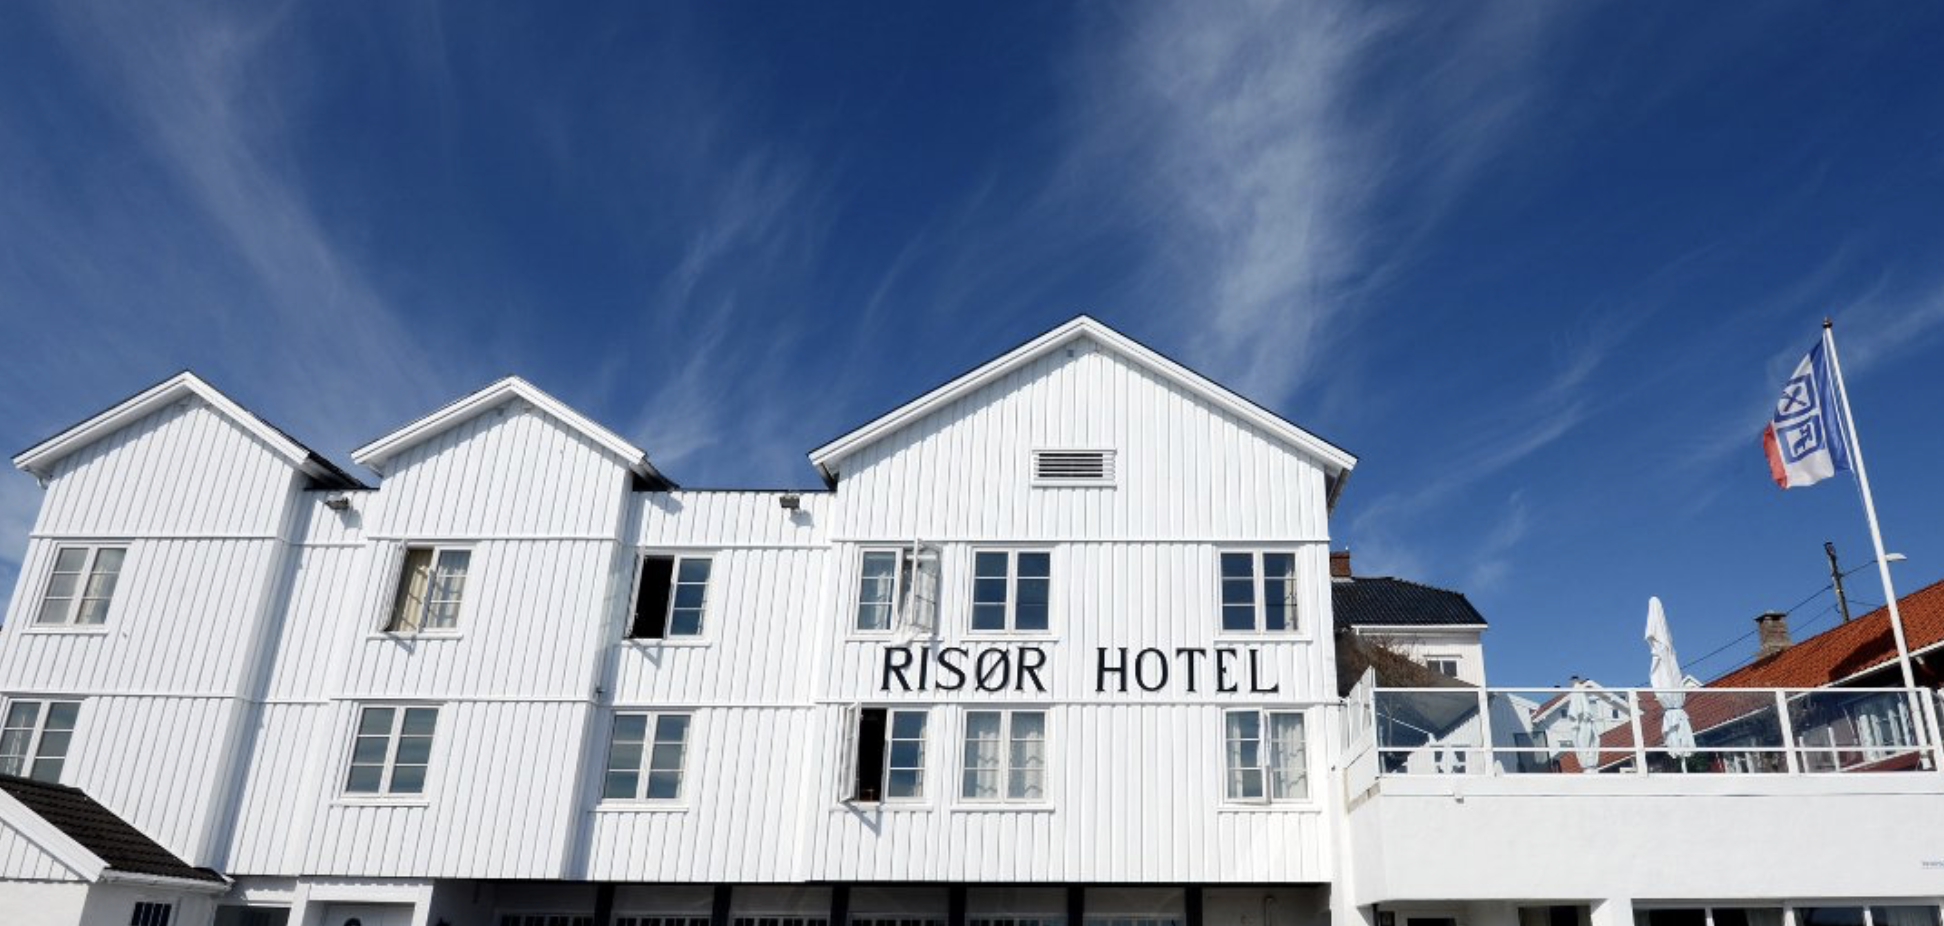 Risør hotell